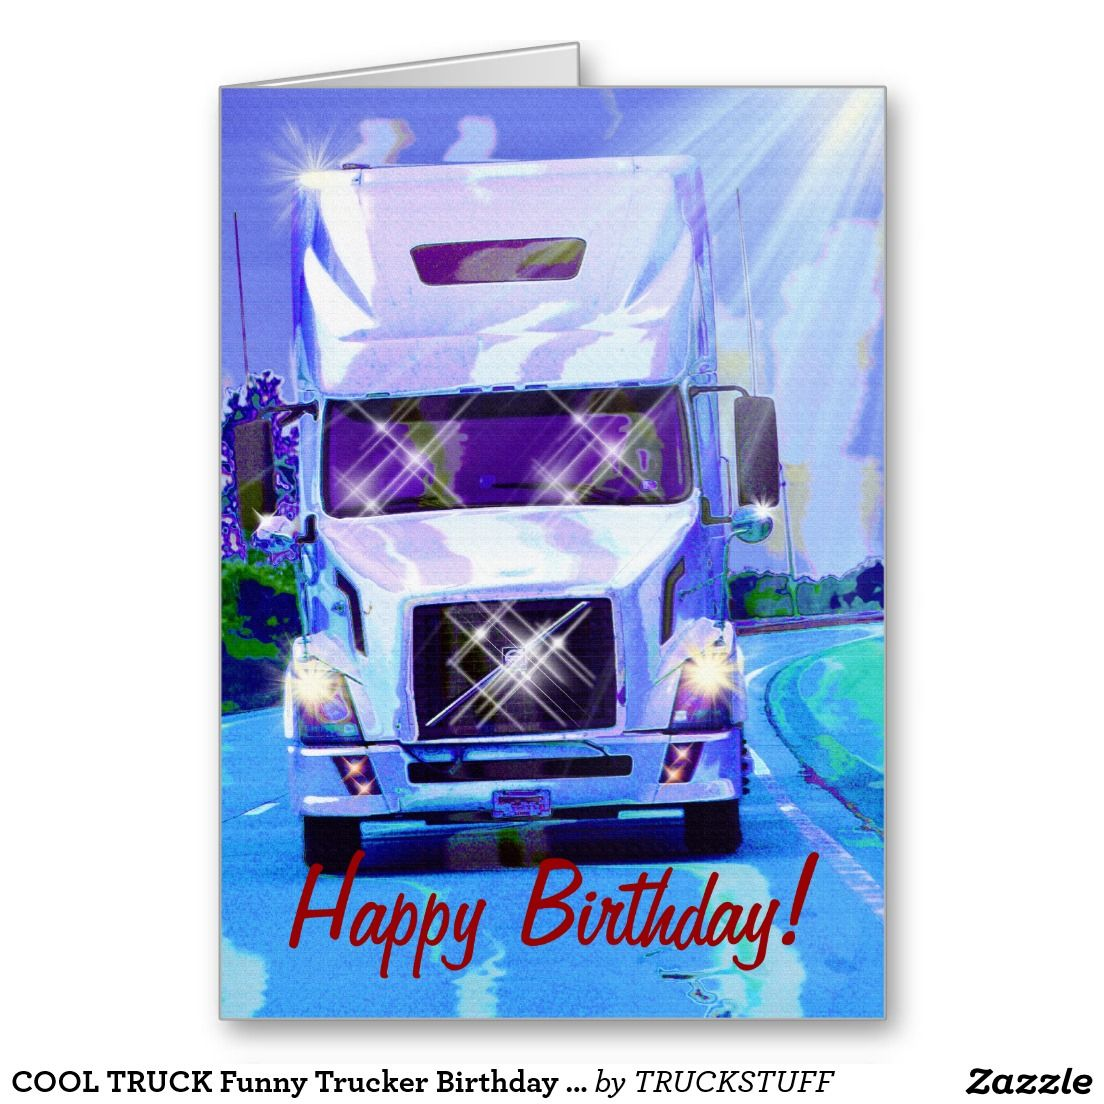 COOL TRUCK Funny Trucker Birthday Cards